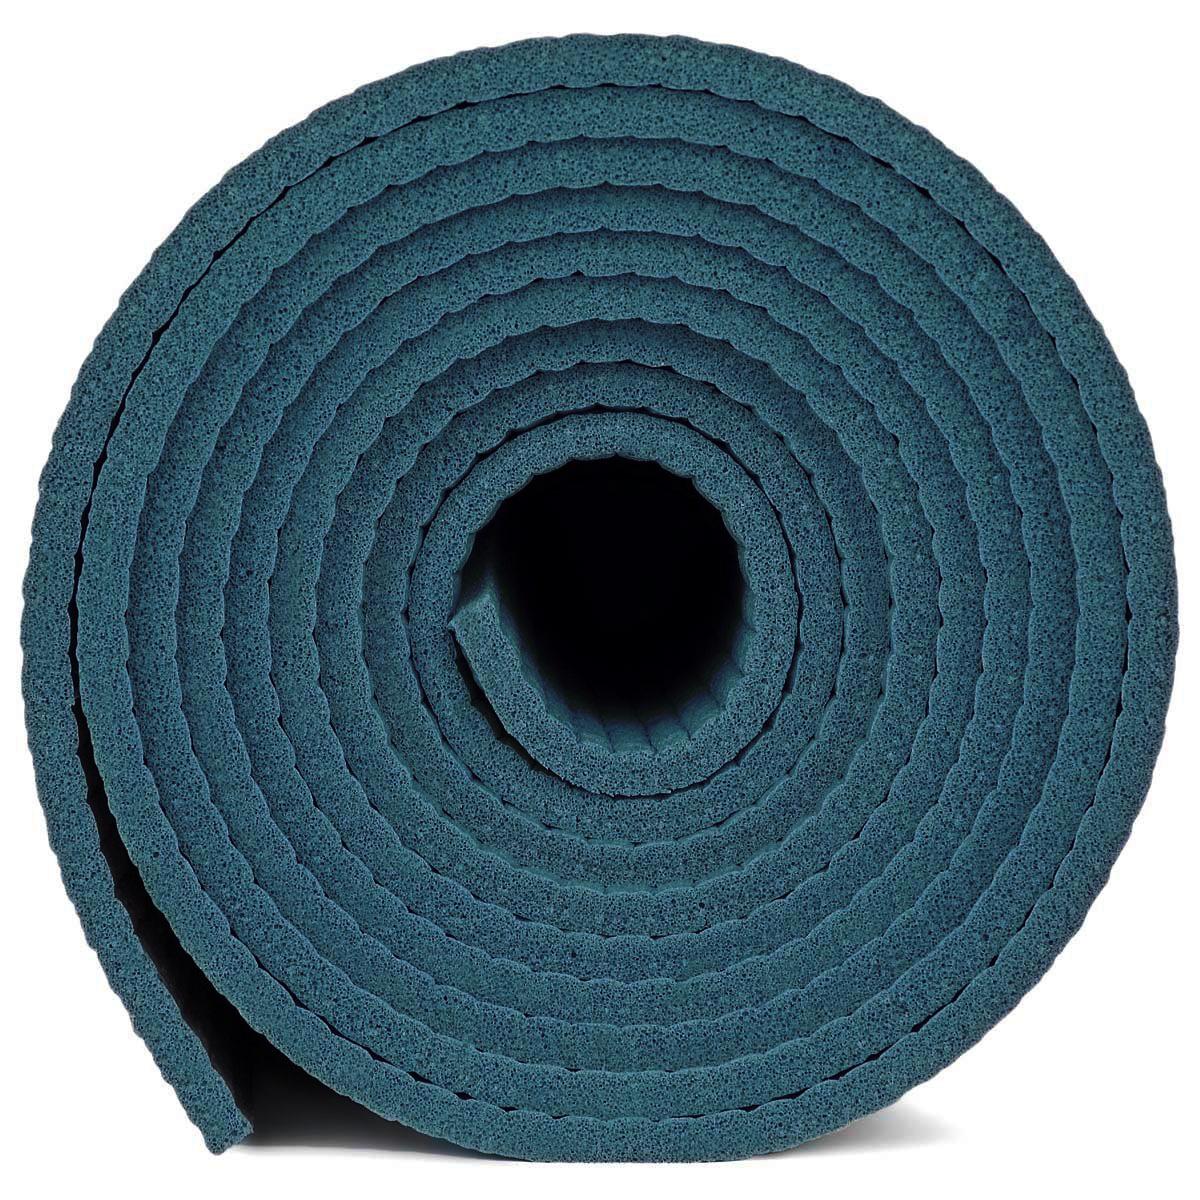 1 4 Inch Yoga Mat 24 Quot X 72 Quot Yoga Direct